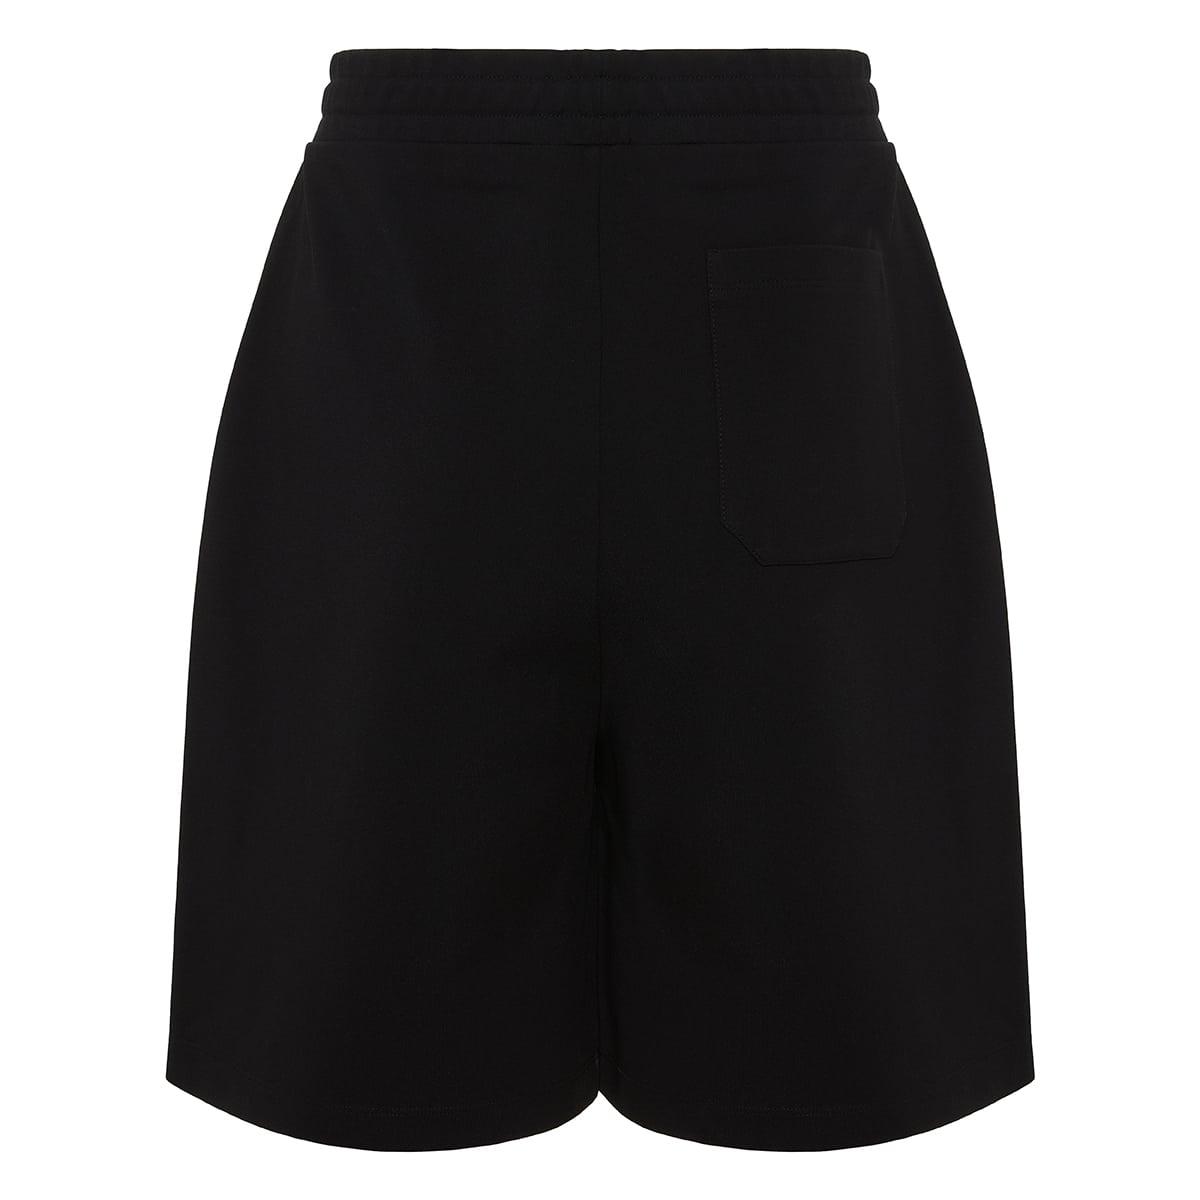 VLTN track shorts